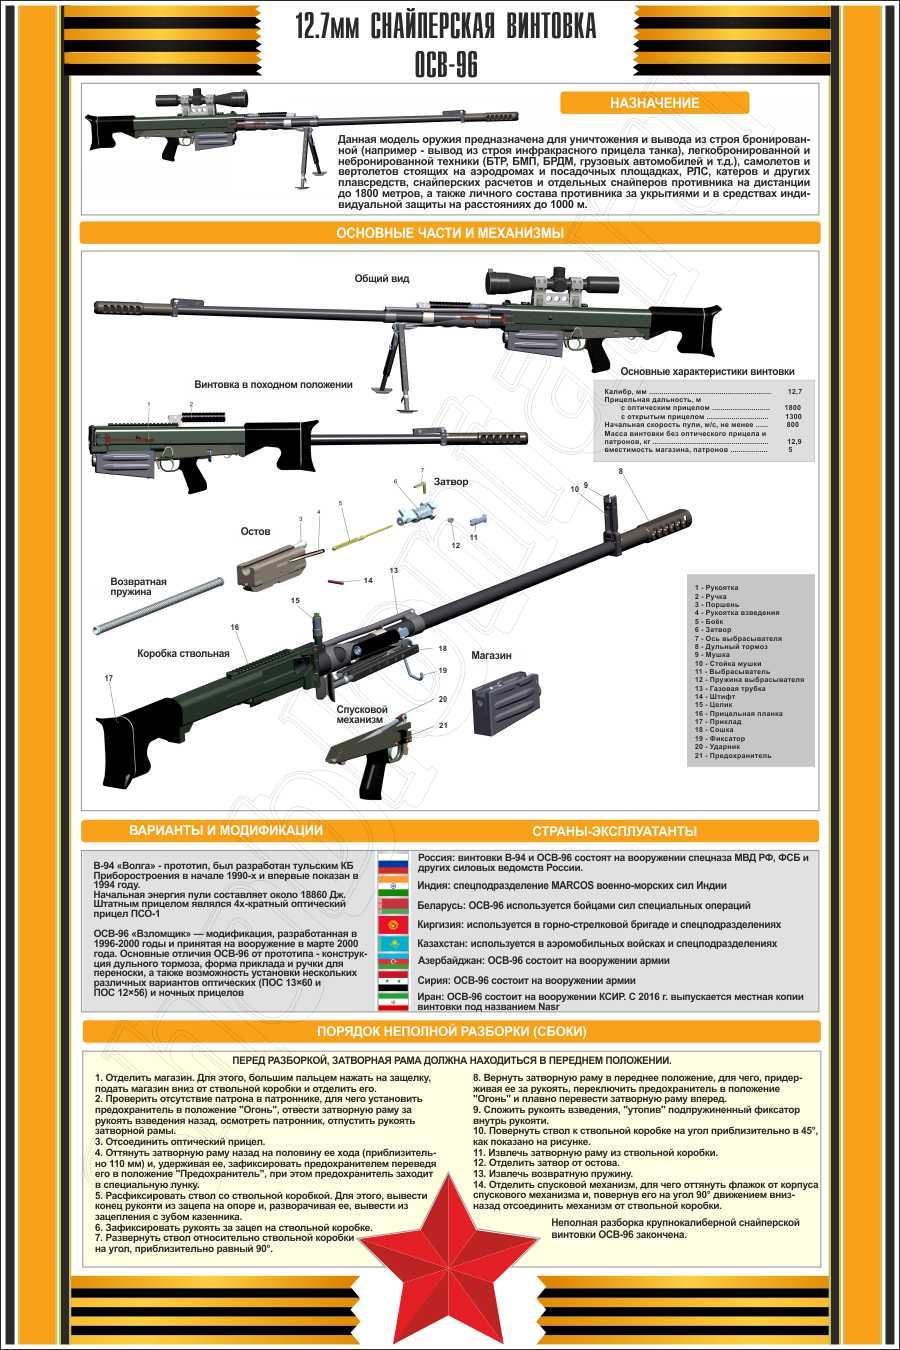 Осв-96 — википедия с видео // wiki 2